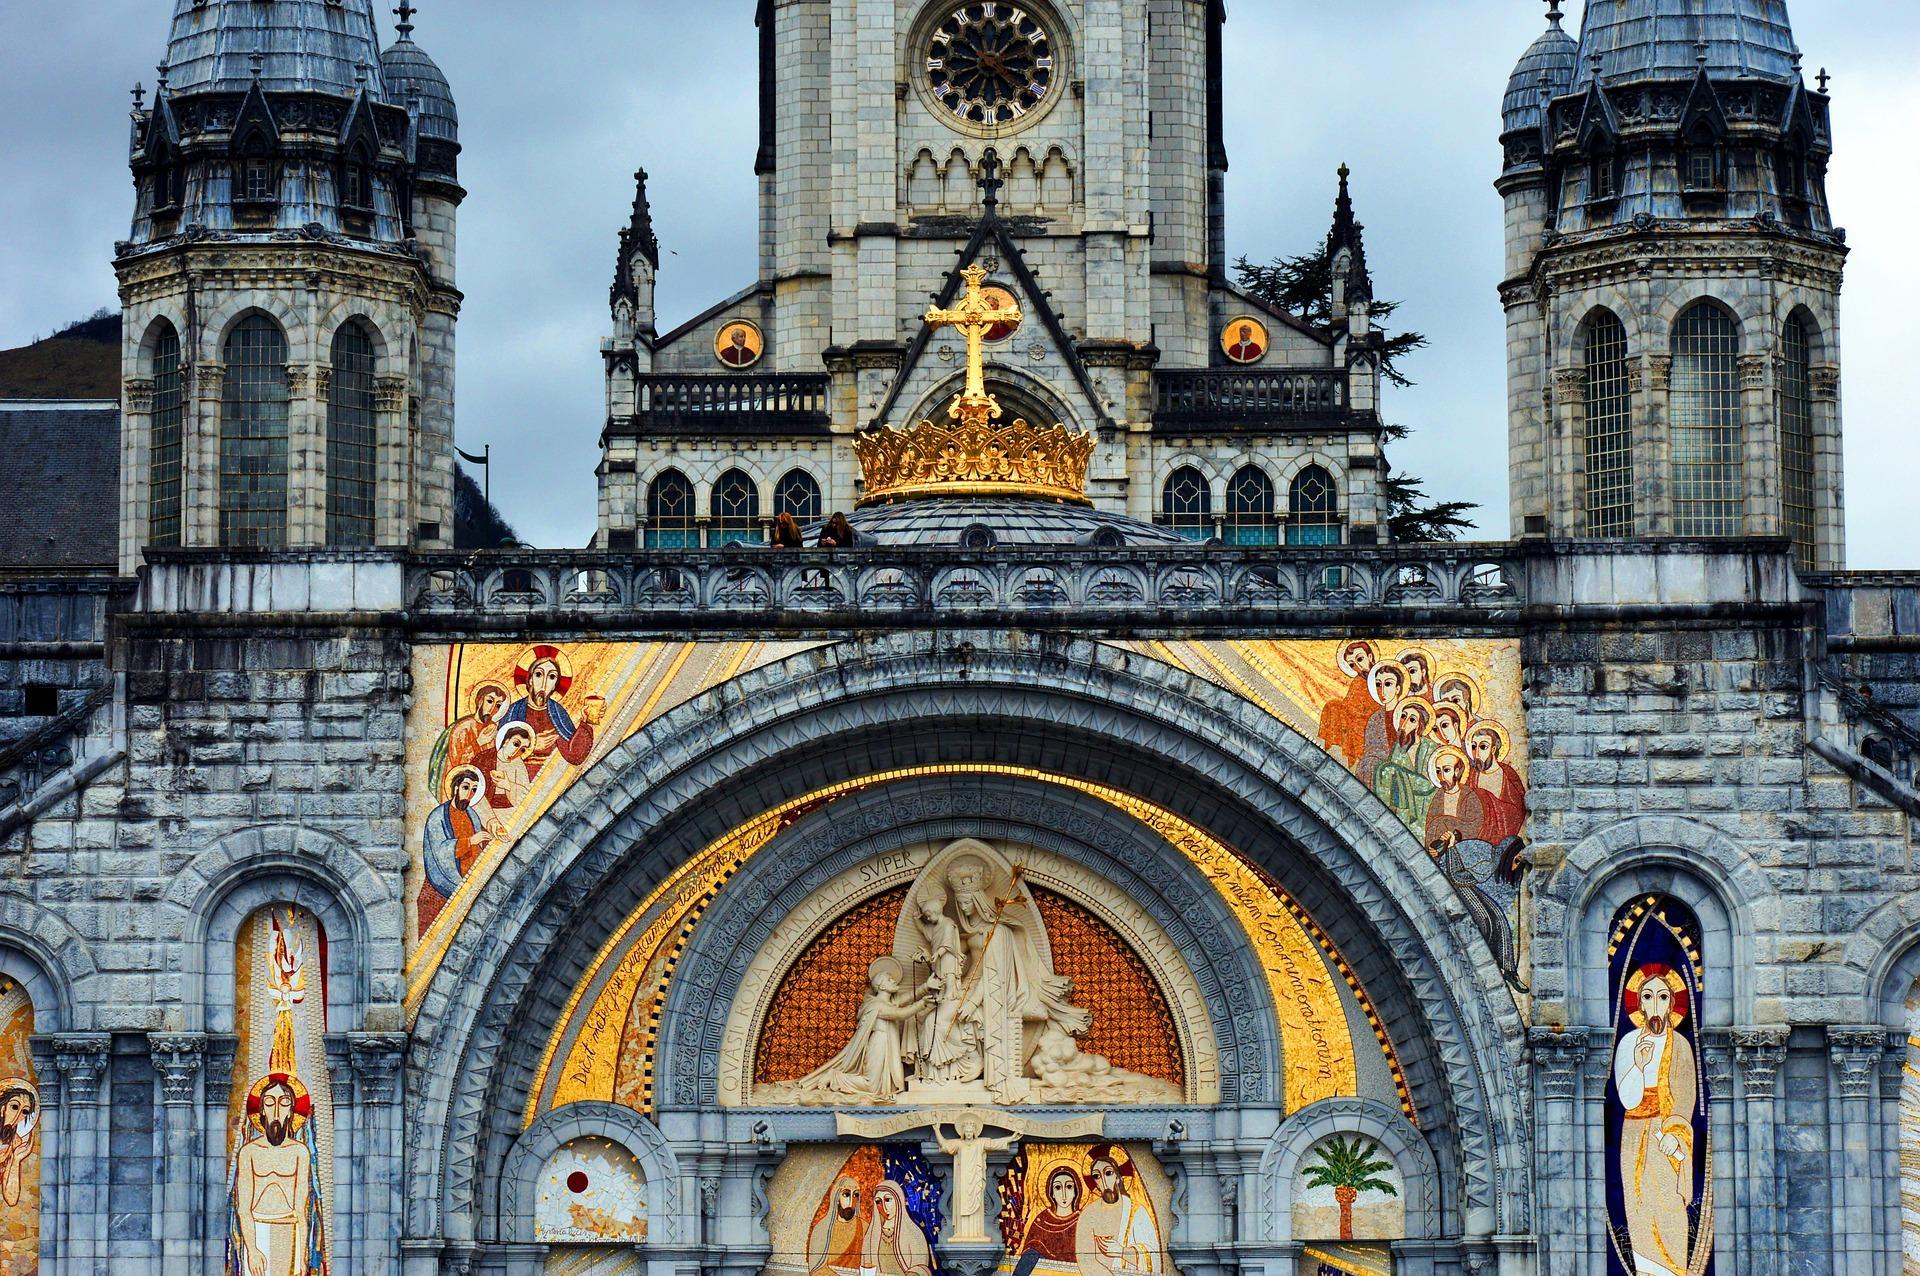 Cathedrale de lourdes en plan rapproche